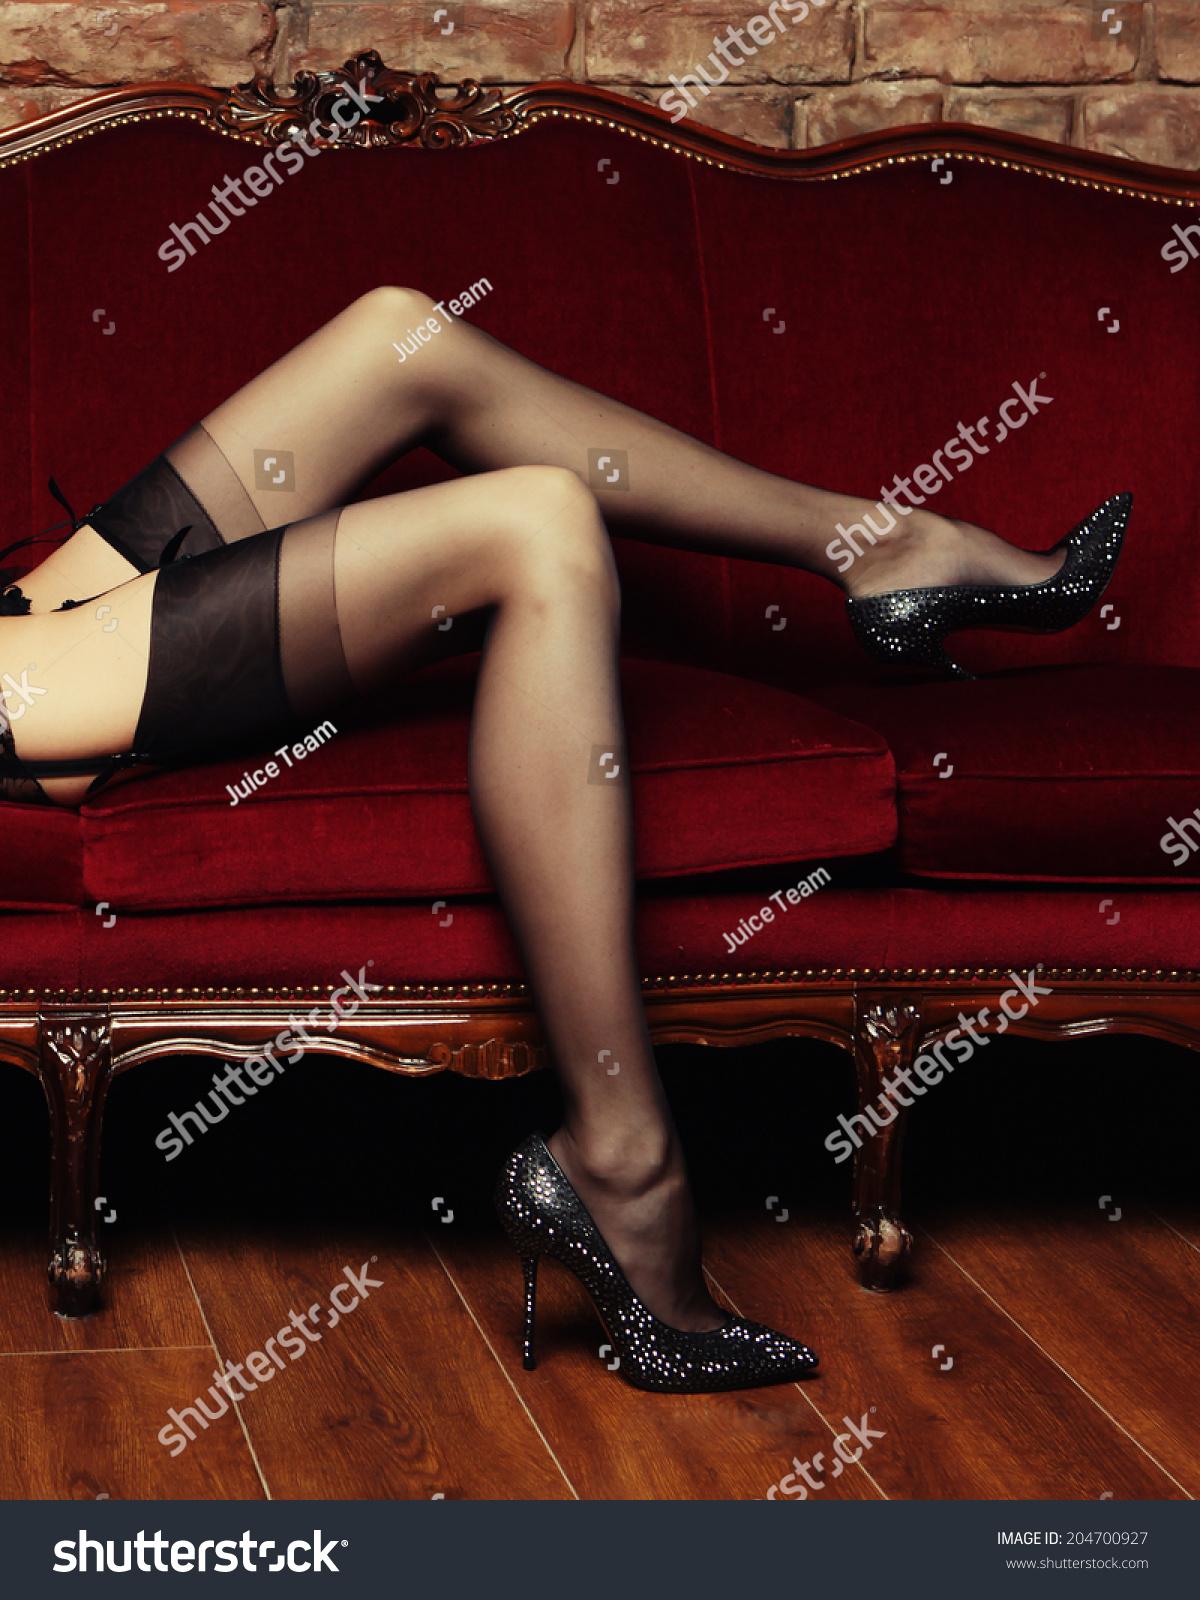 Handjob massage beautiful nude women in stockings lingerie pic galleries